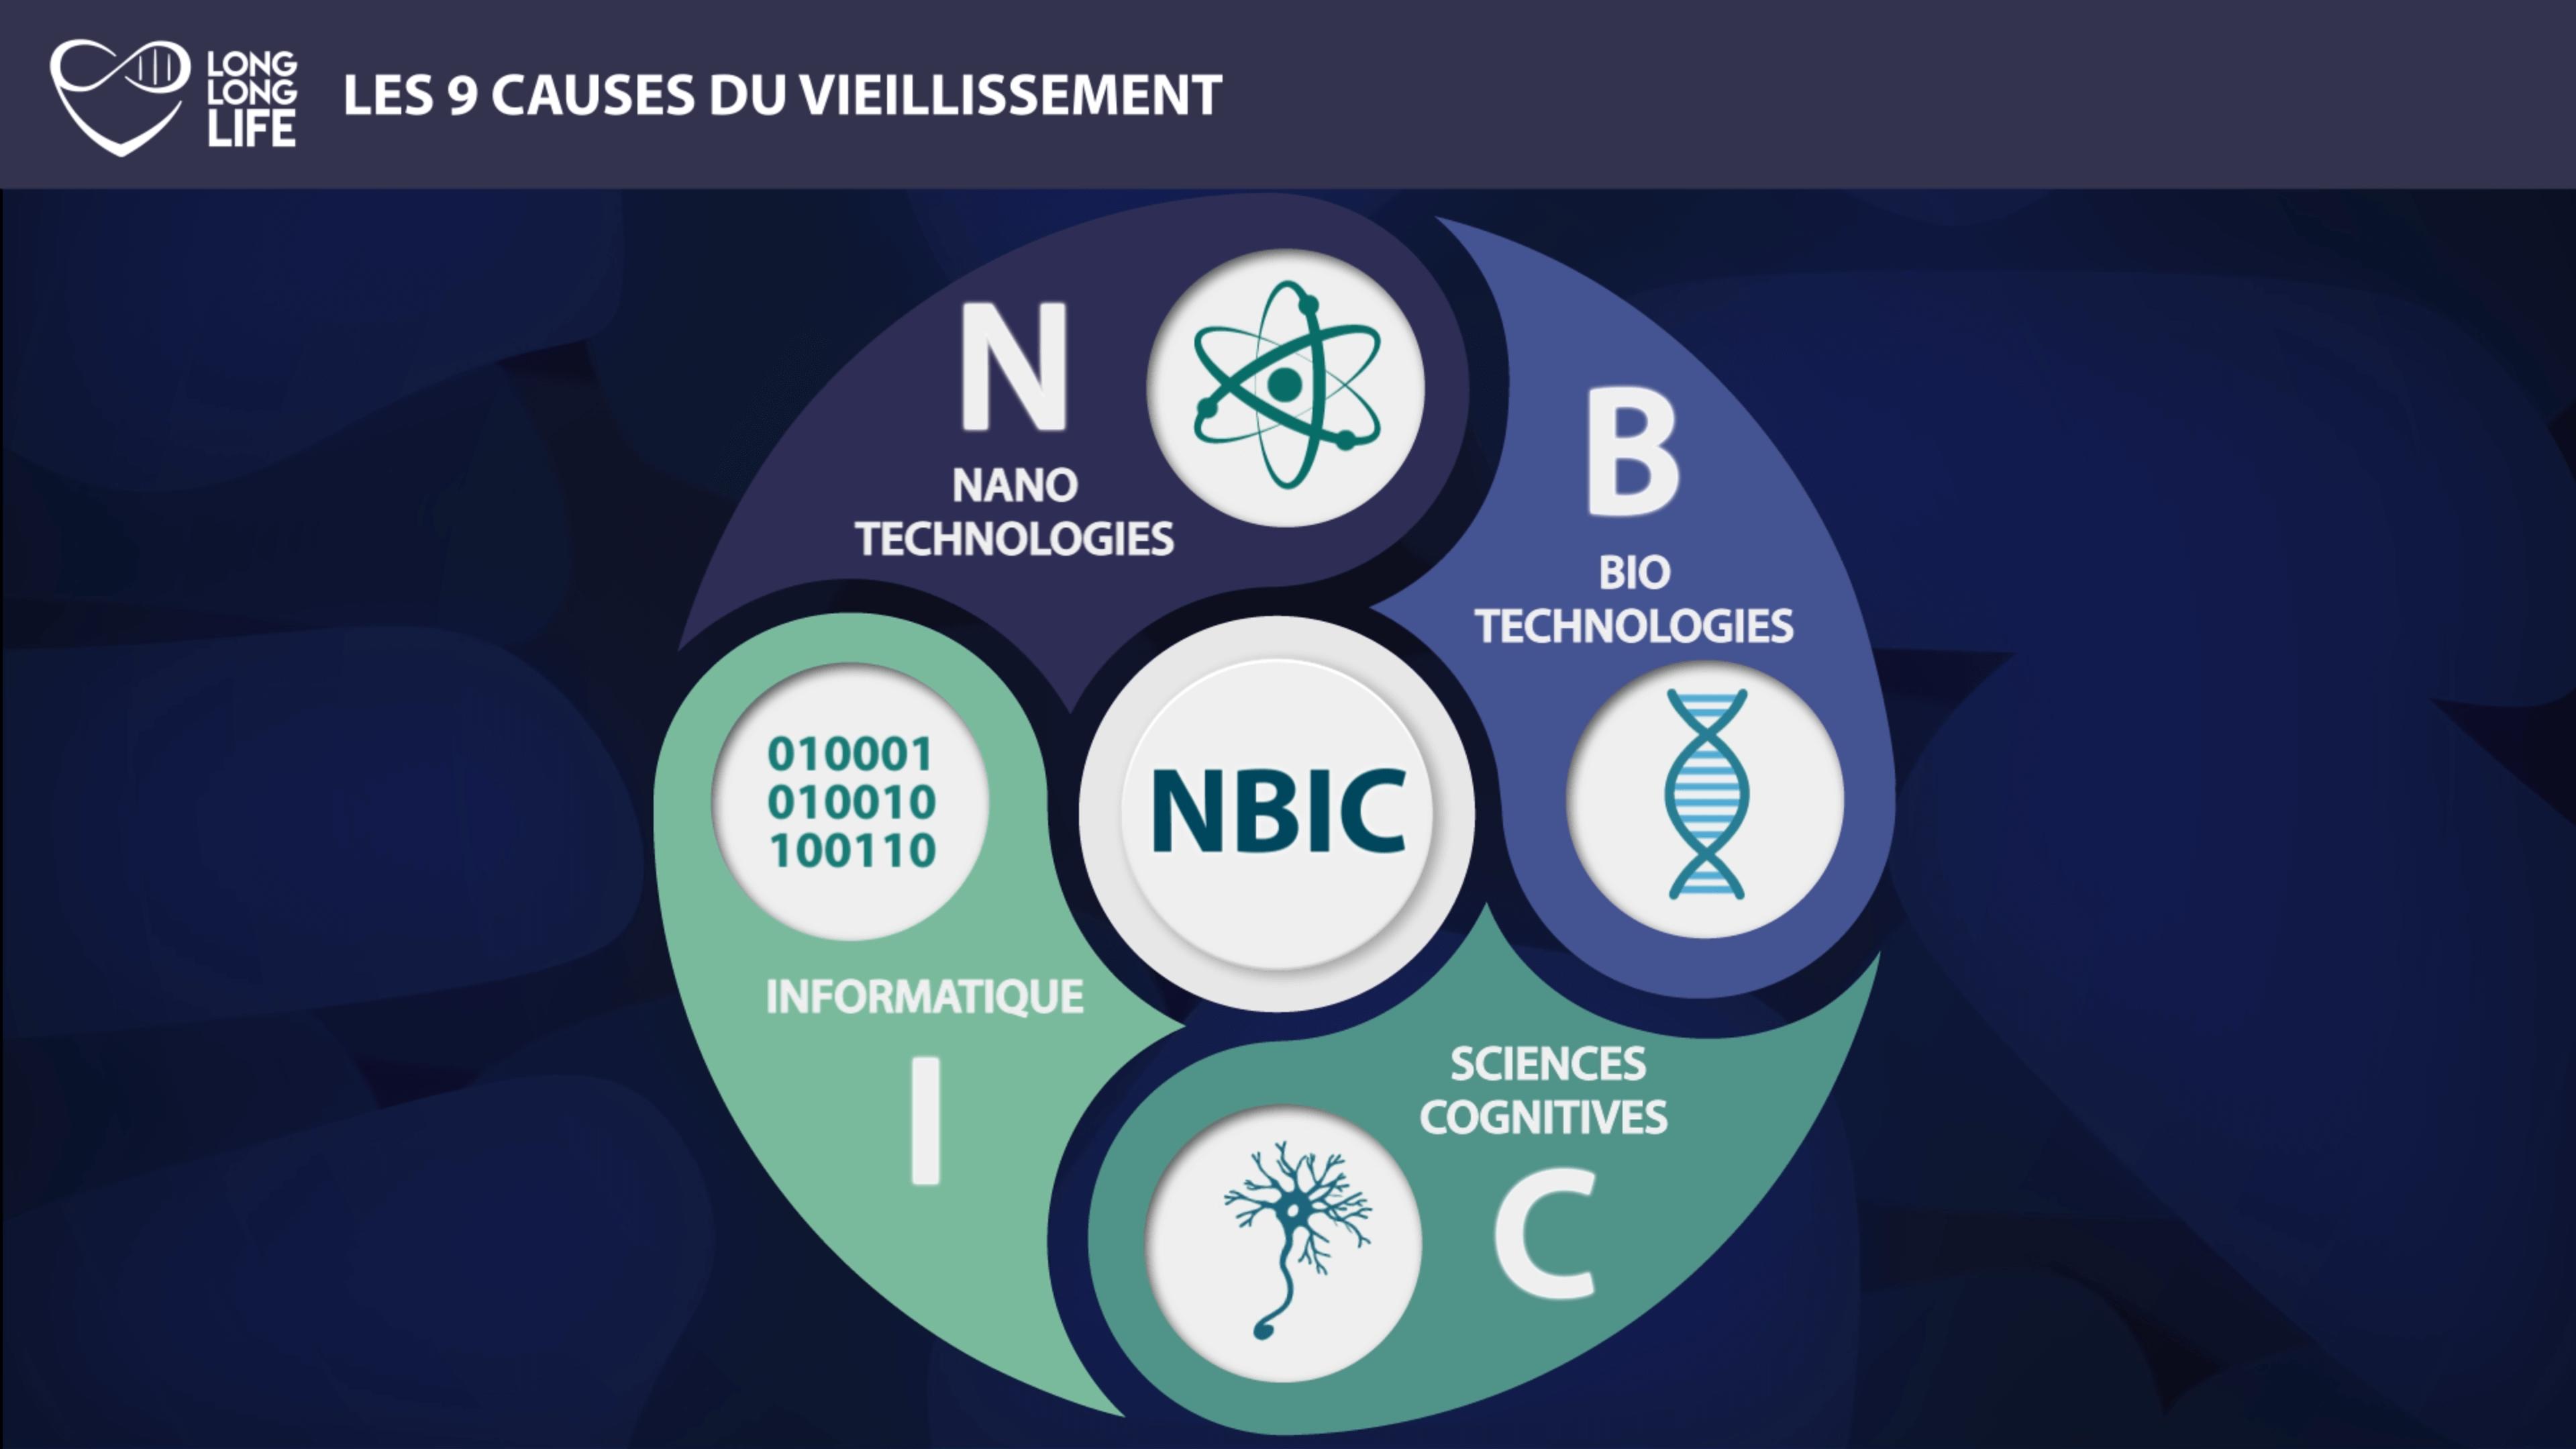 ADN 9 causes du vieillissement Long Long Life longévité transhumanisme NBIC